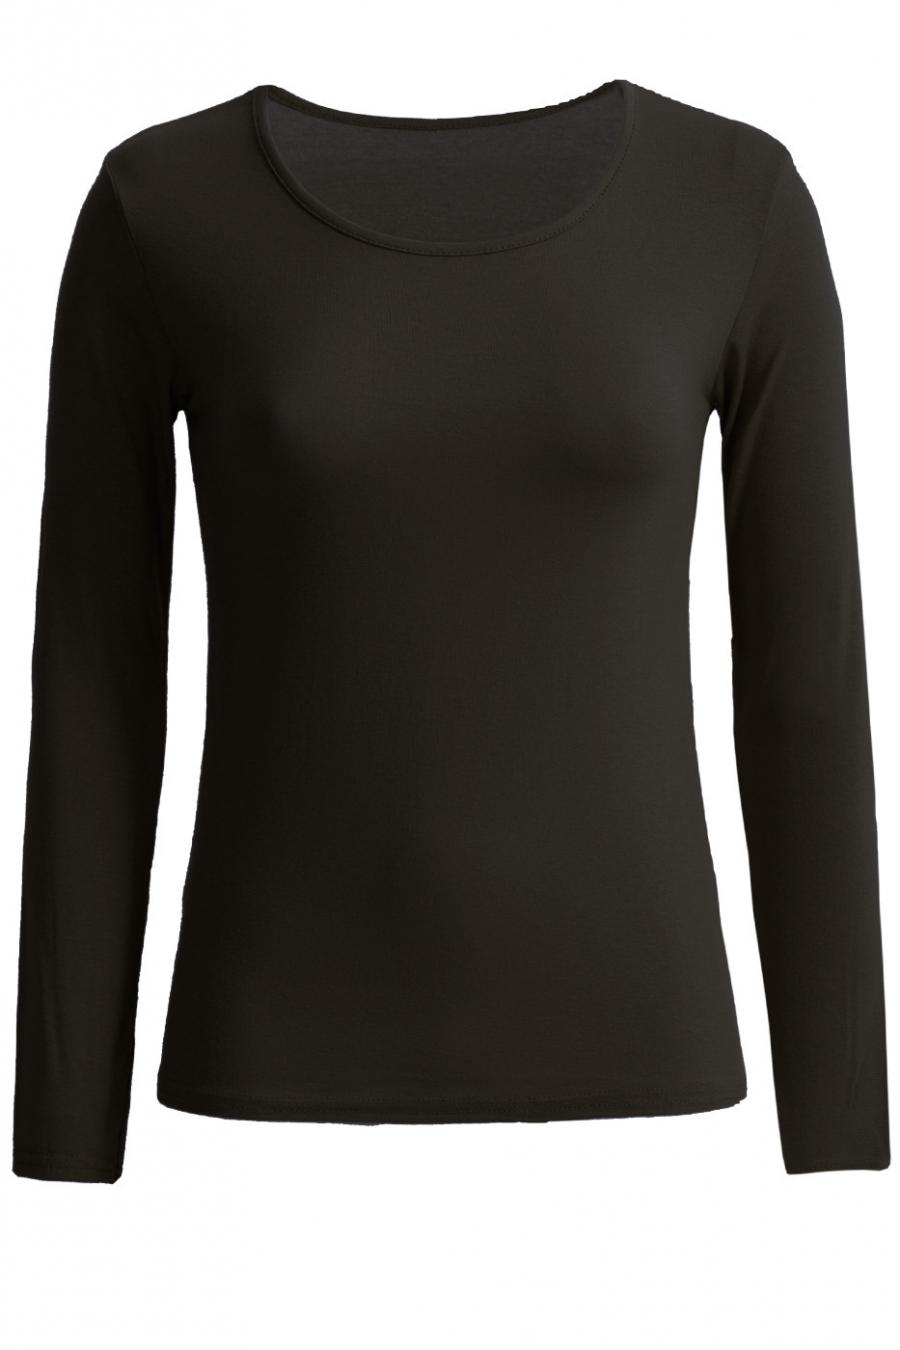 Very trendy black round neck sweater. Cheap women's clothing.